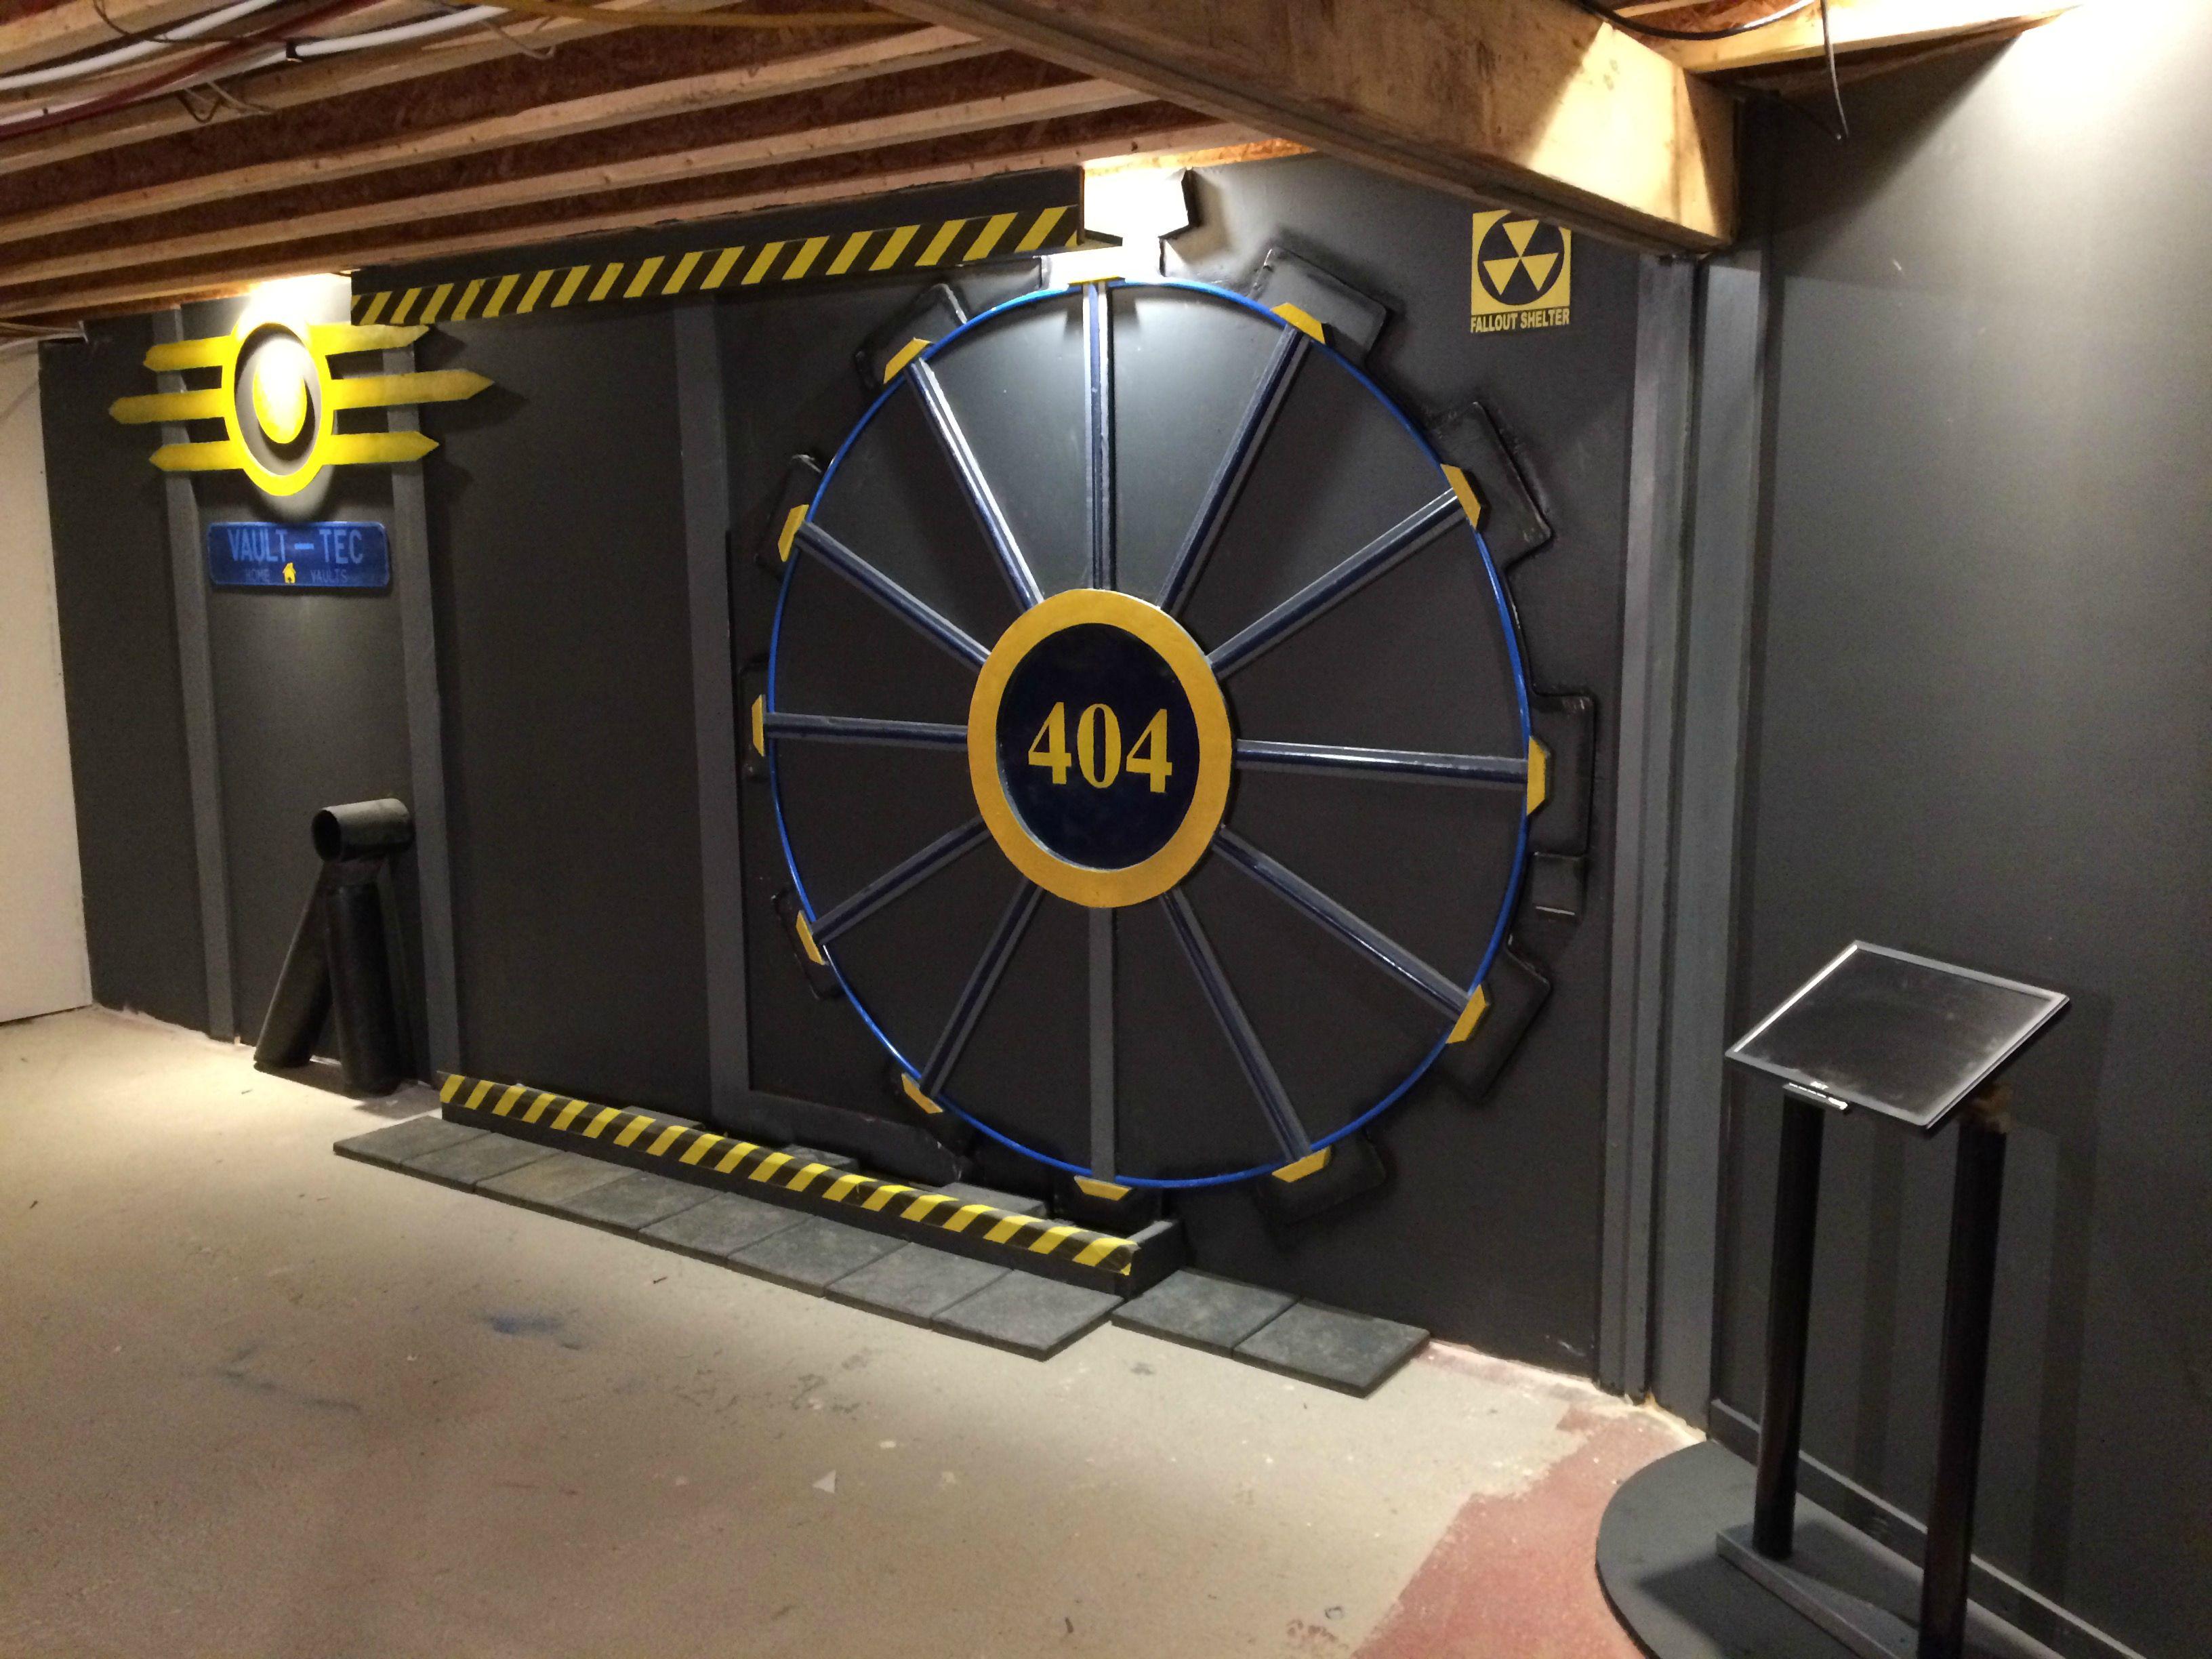 Fallout Vault Door fallout fan builds vault-tec door, is awesome | pc gamer